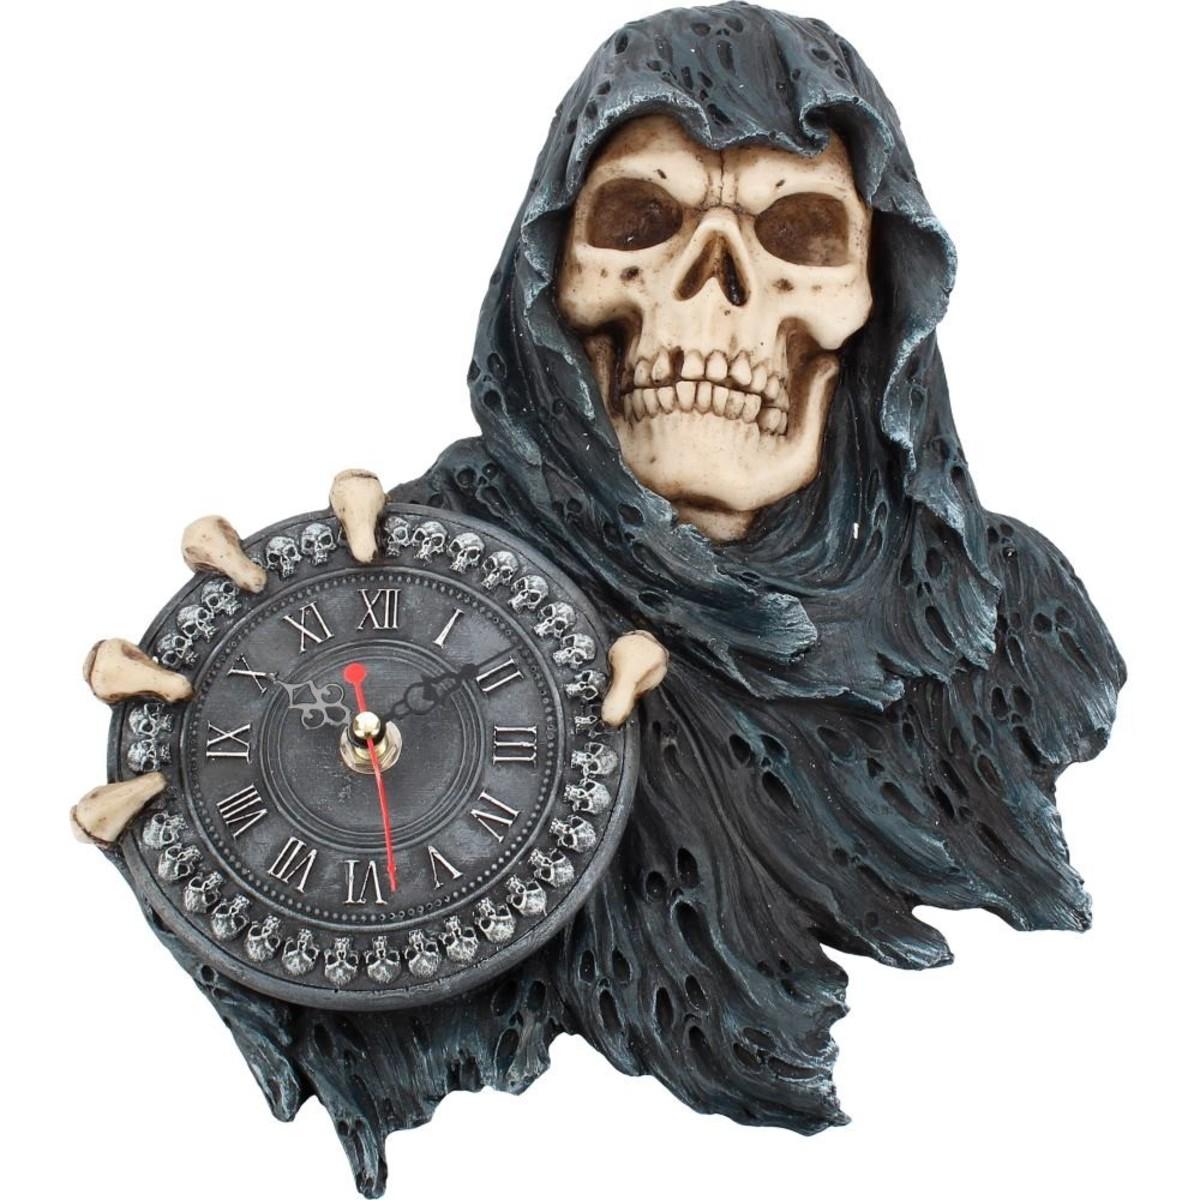 dekorácia (hodiny) Face of Time - D3600J7